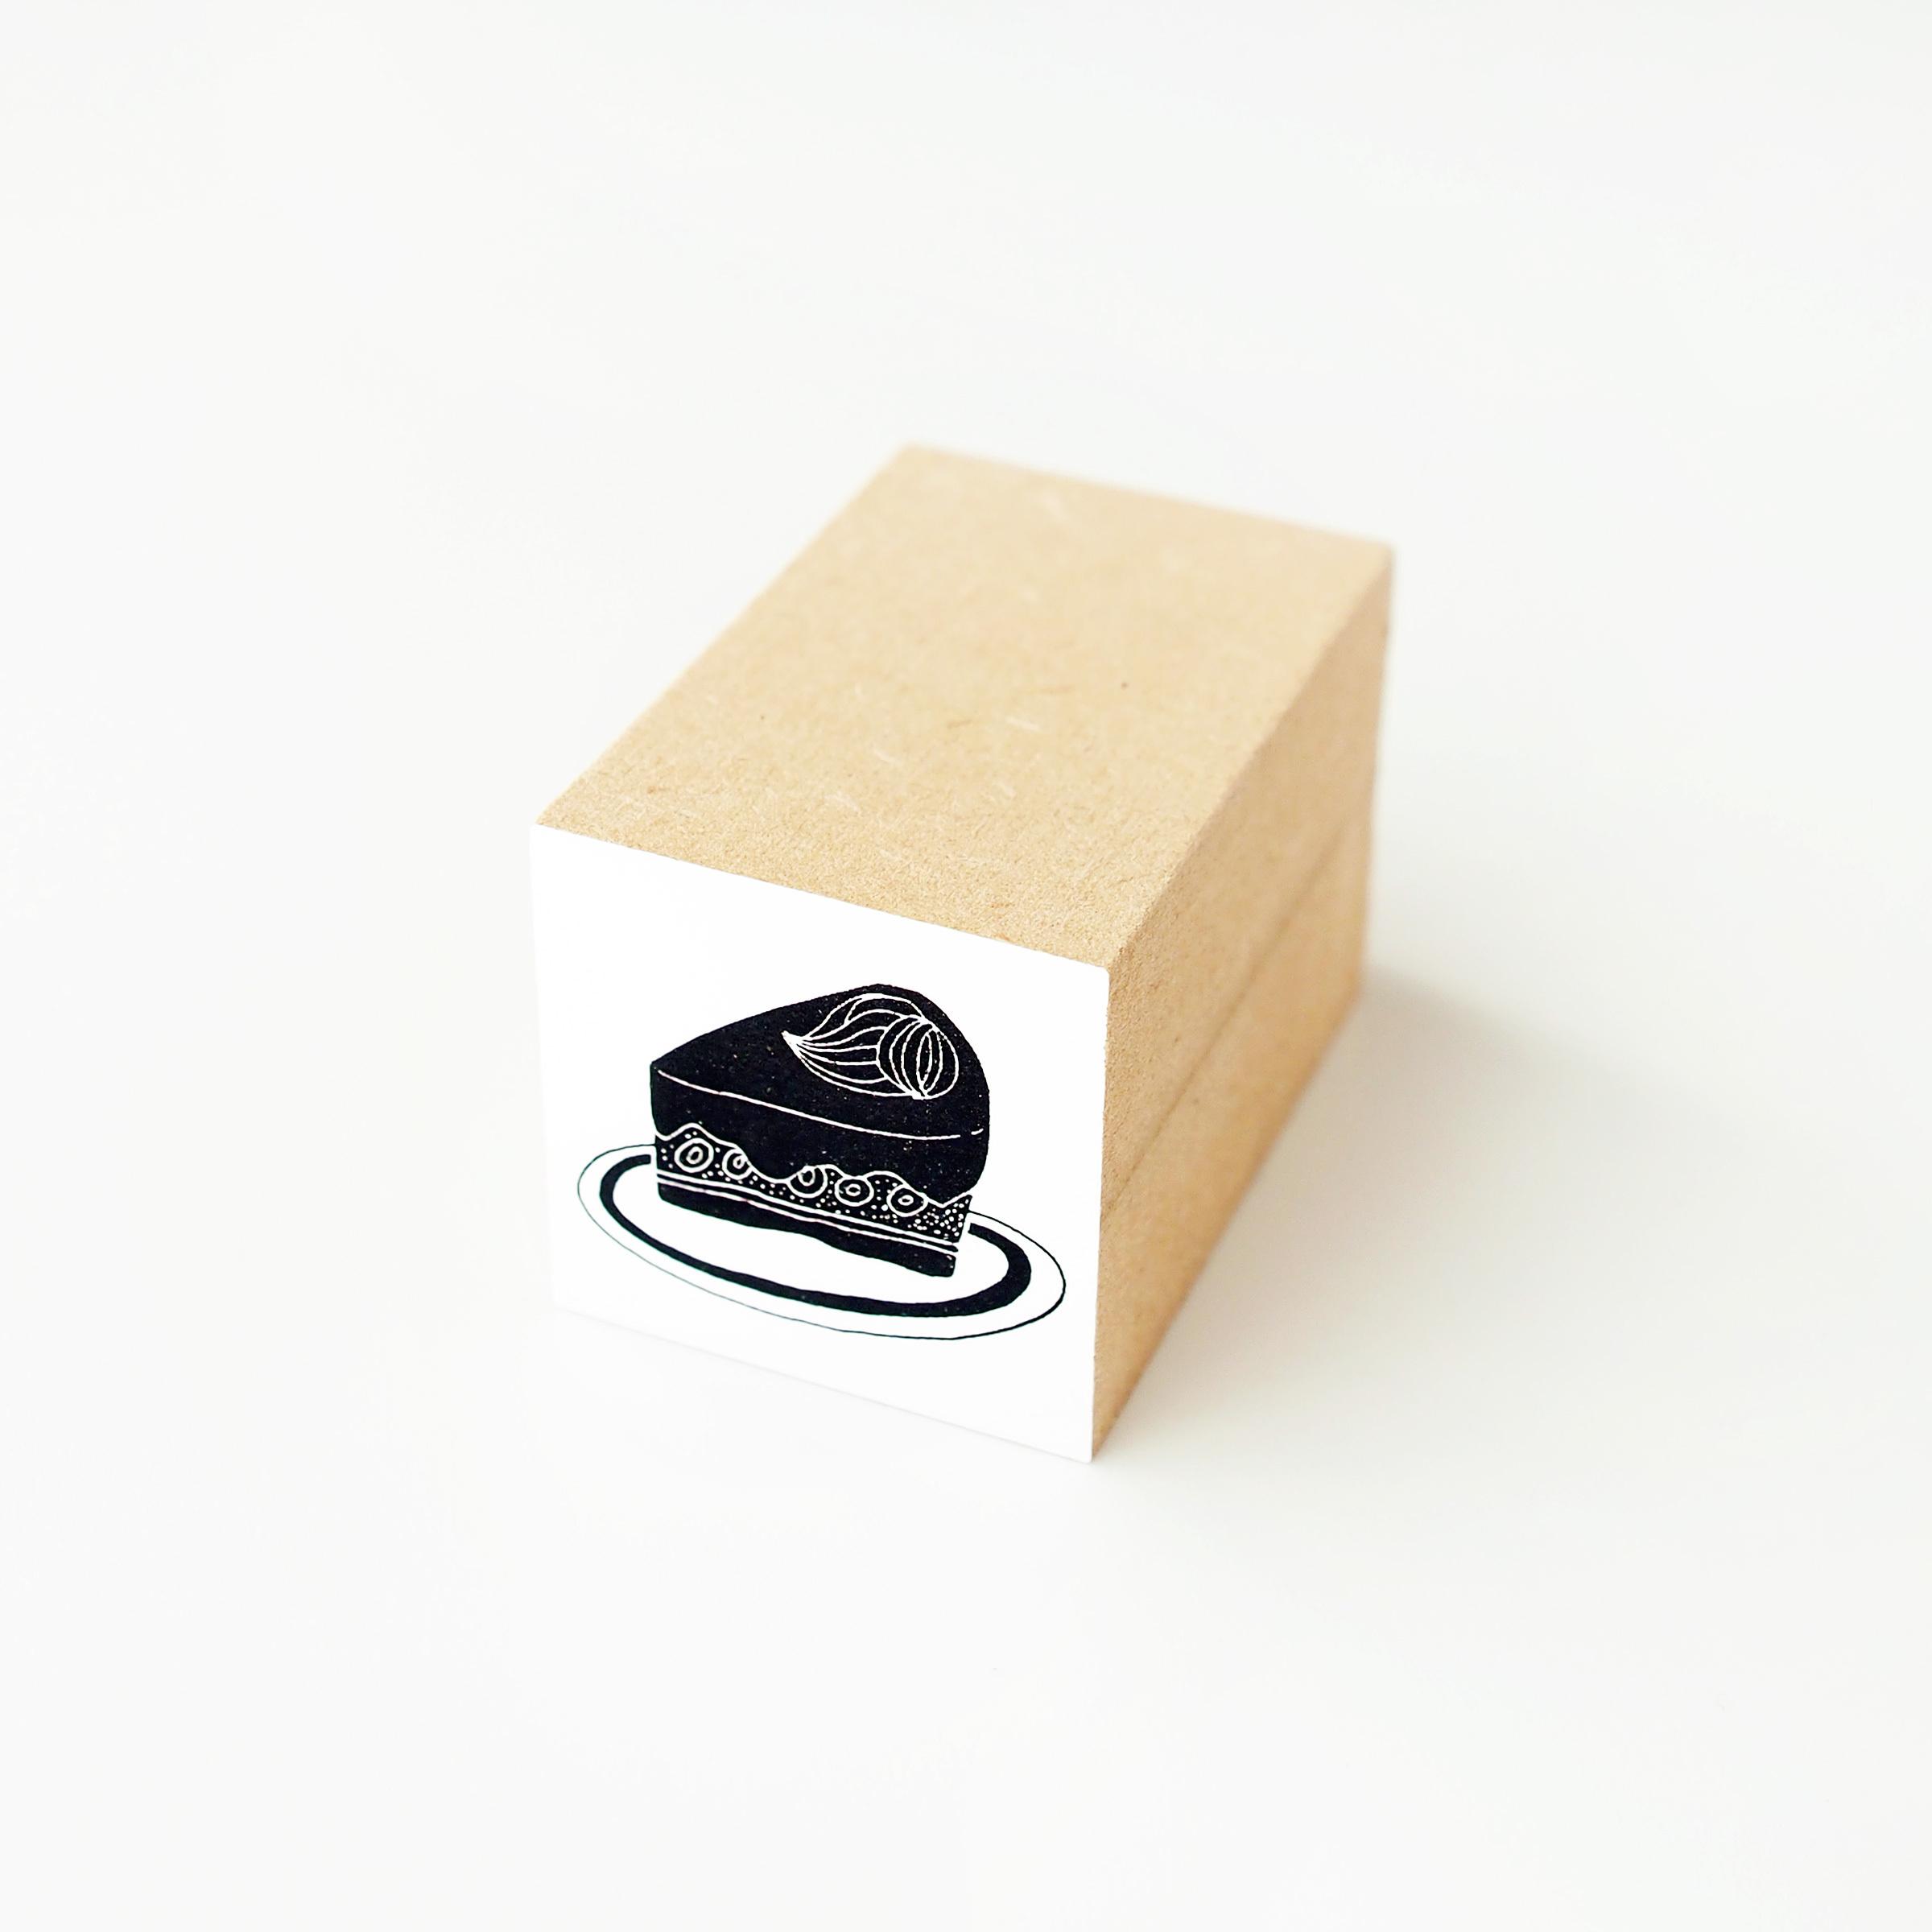 【4L】POCONUR STAMP(ポコヌルスタンプ)|クロ